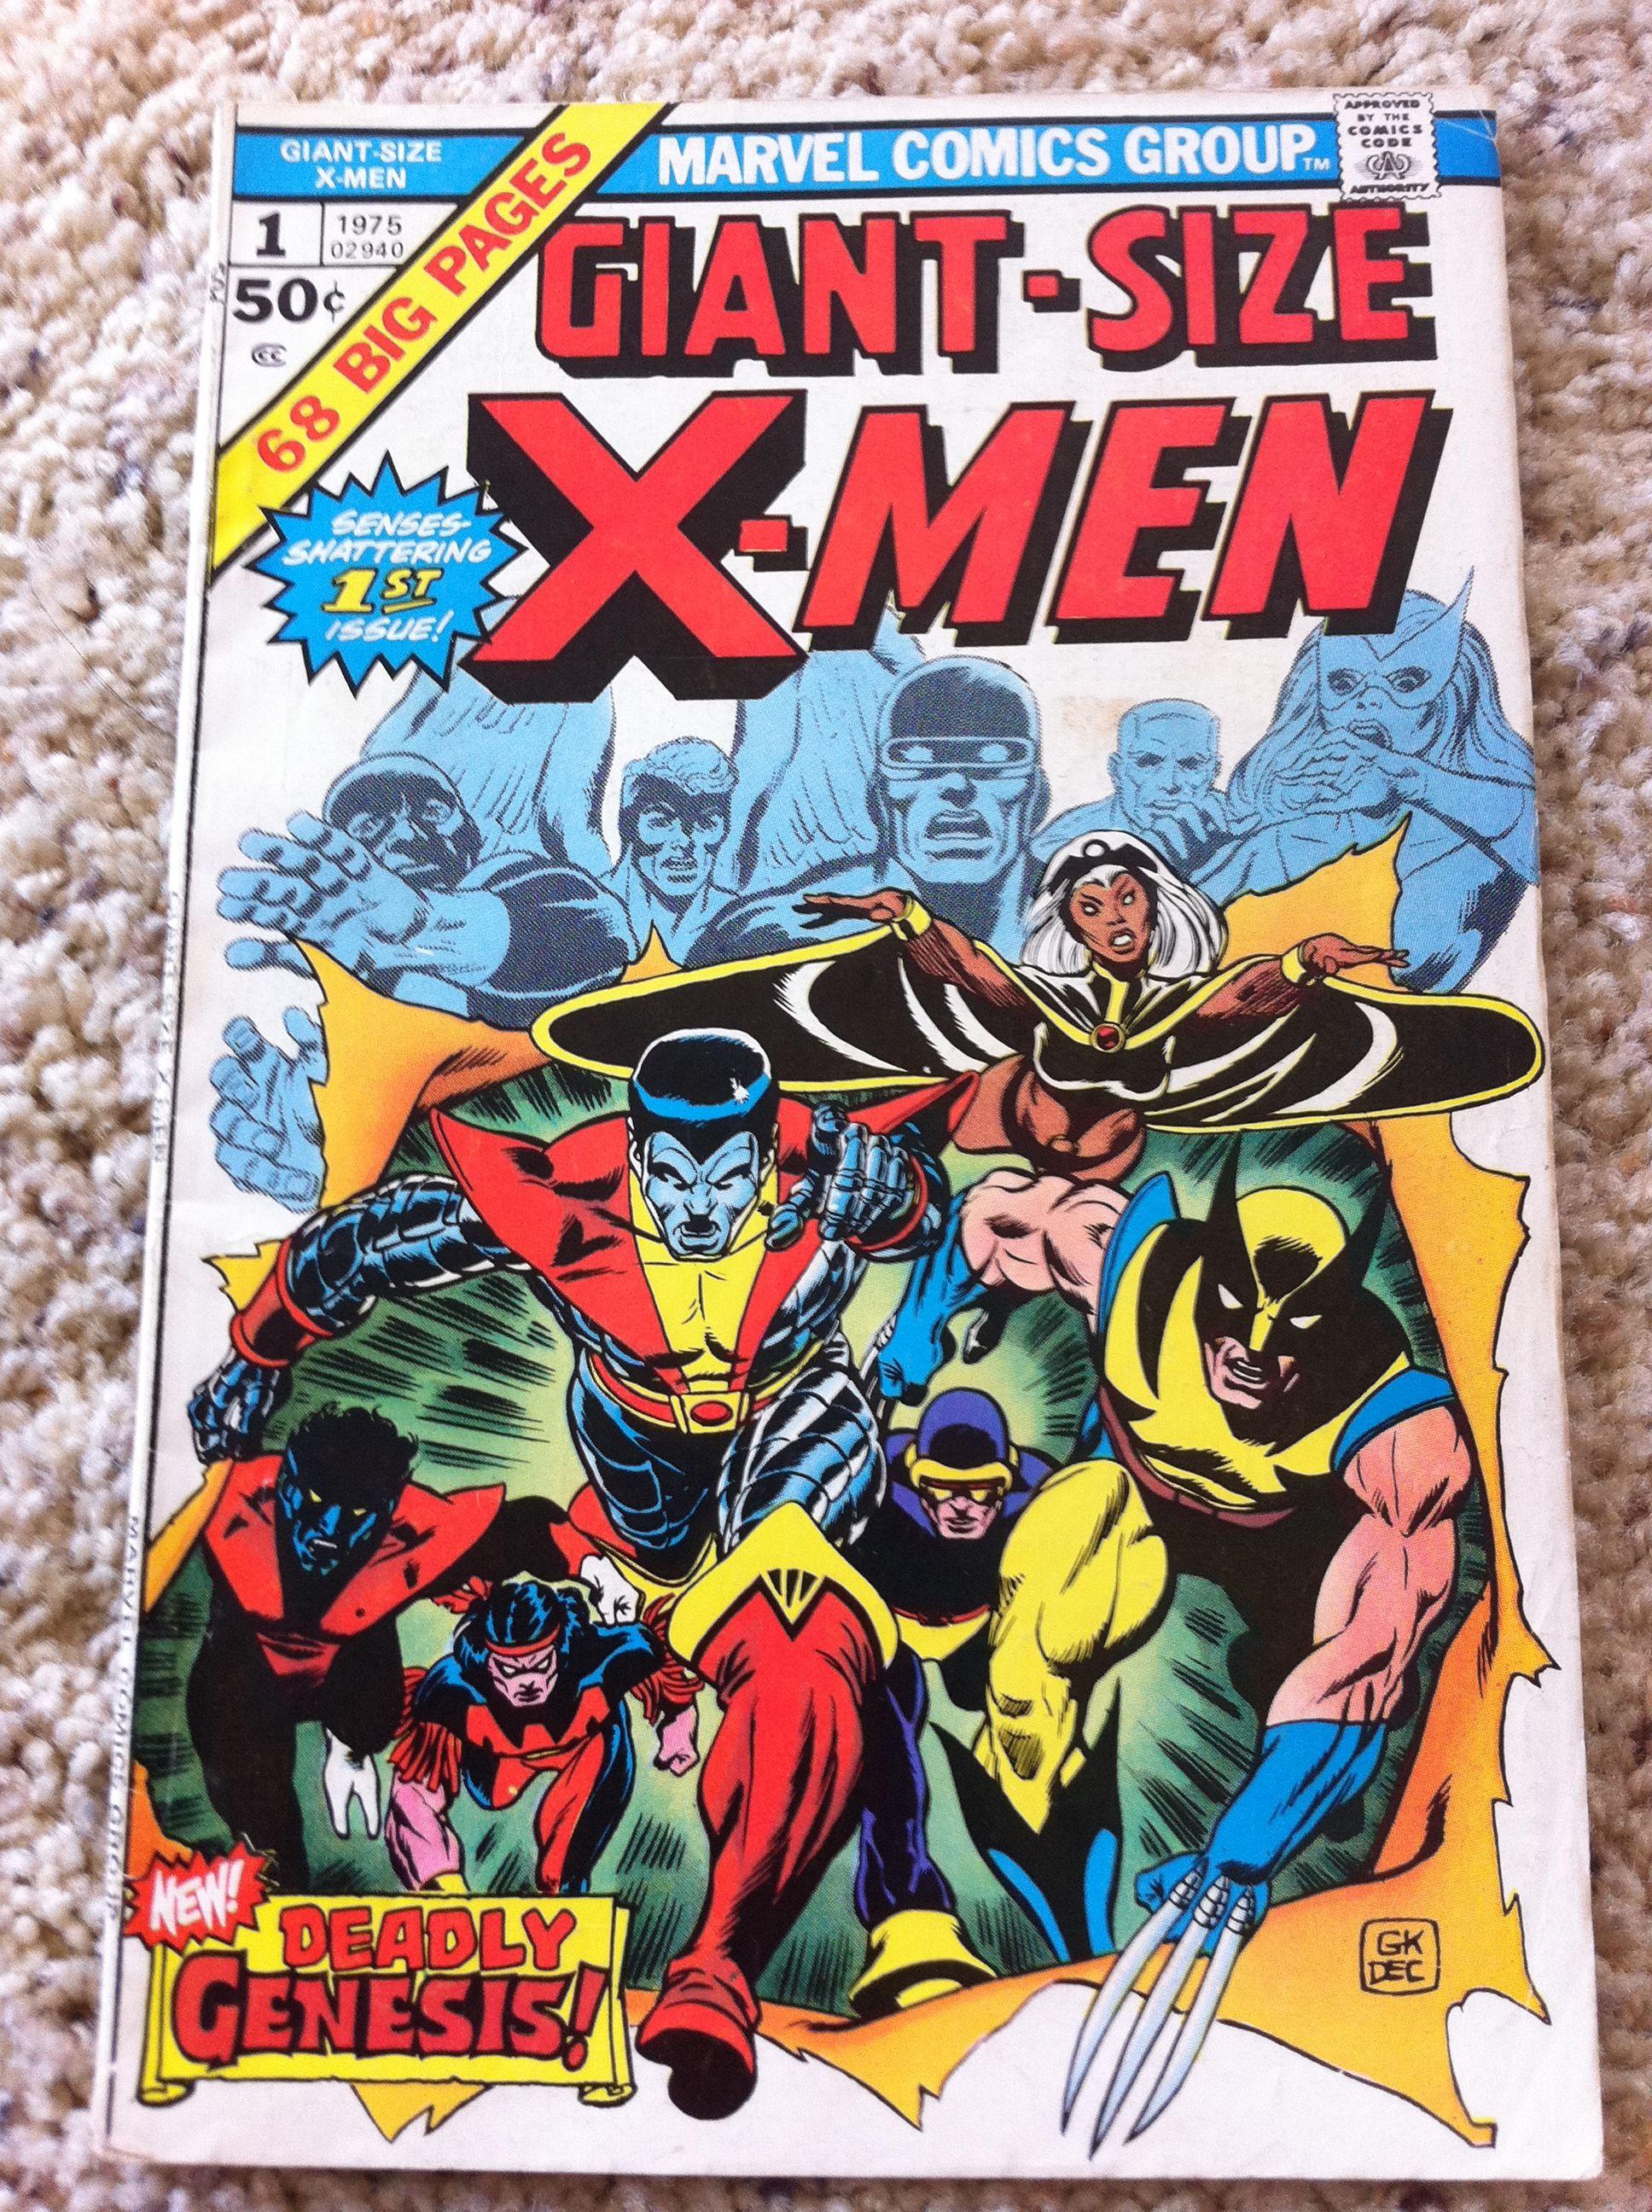 Giant Size X Men 1 Comic Covers Marvel Comic Books Comic Book Covers